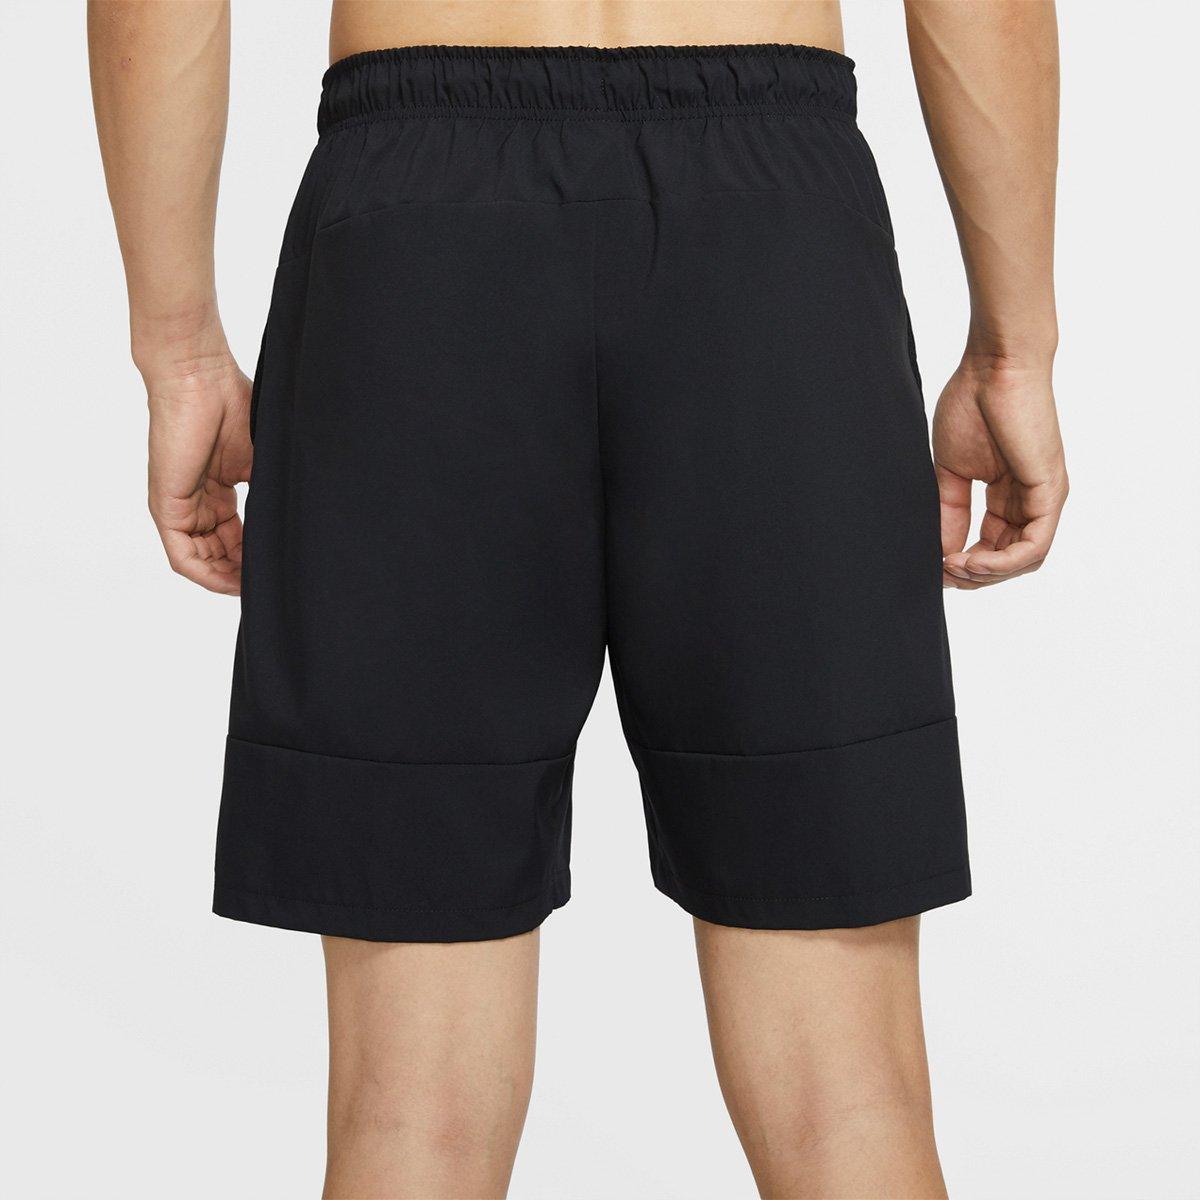 Bermuda Nike FLX Short Woven 3.0 - Masculina  - PROTENISTA